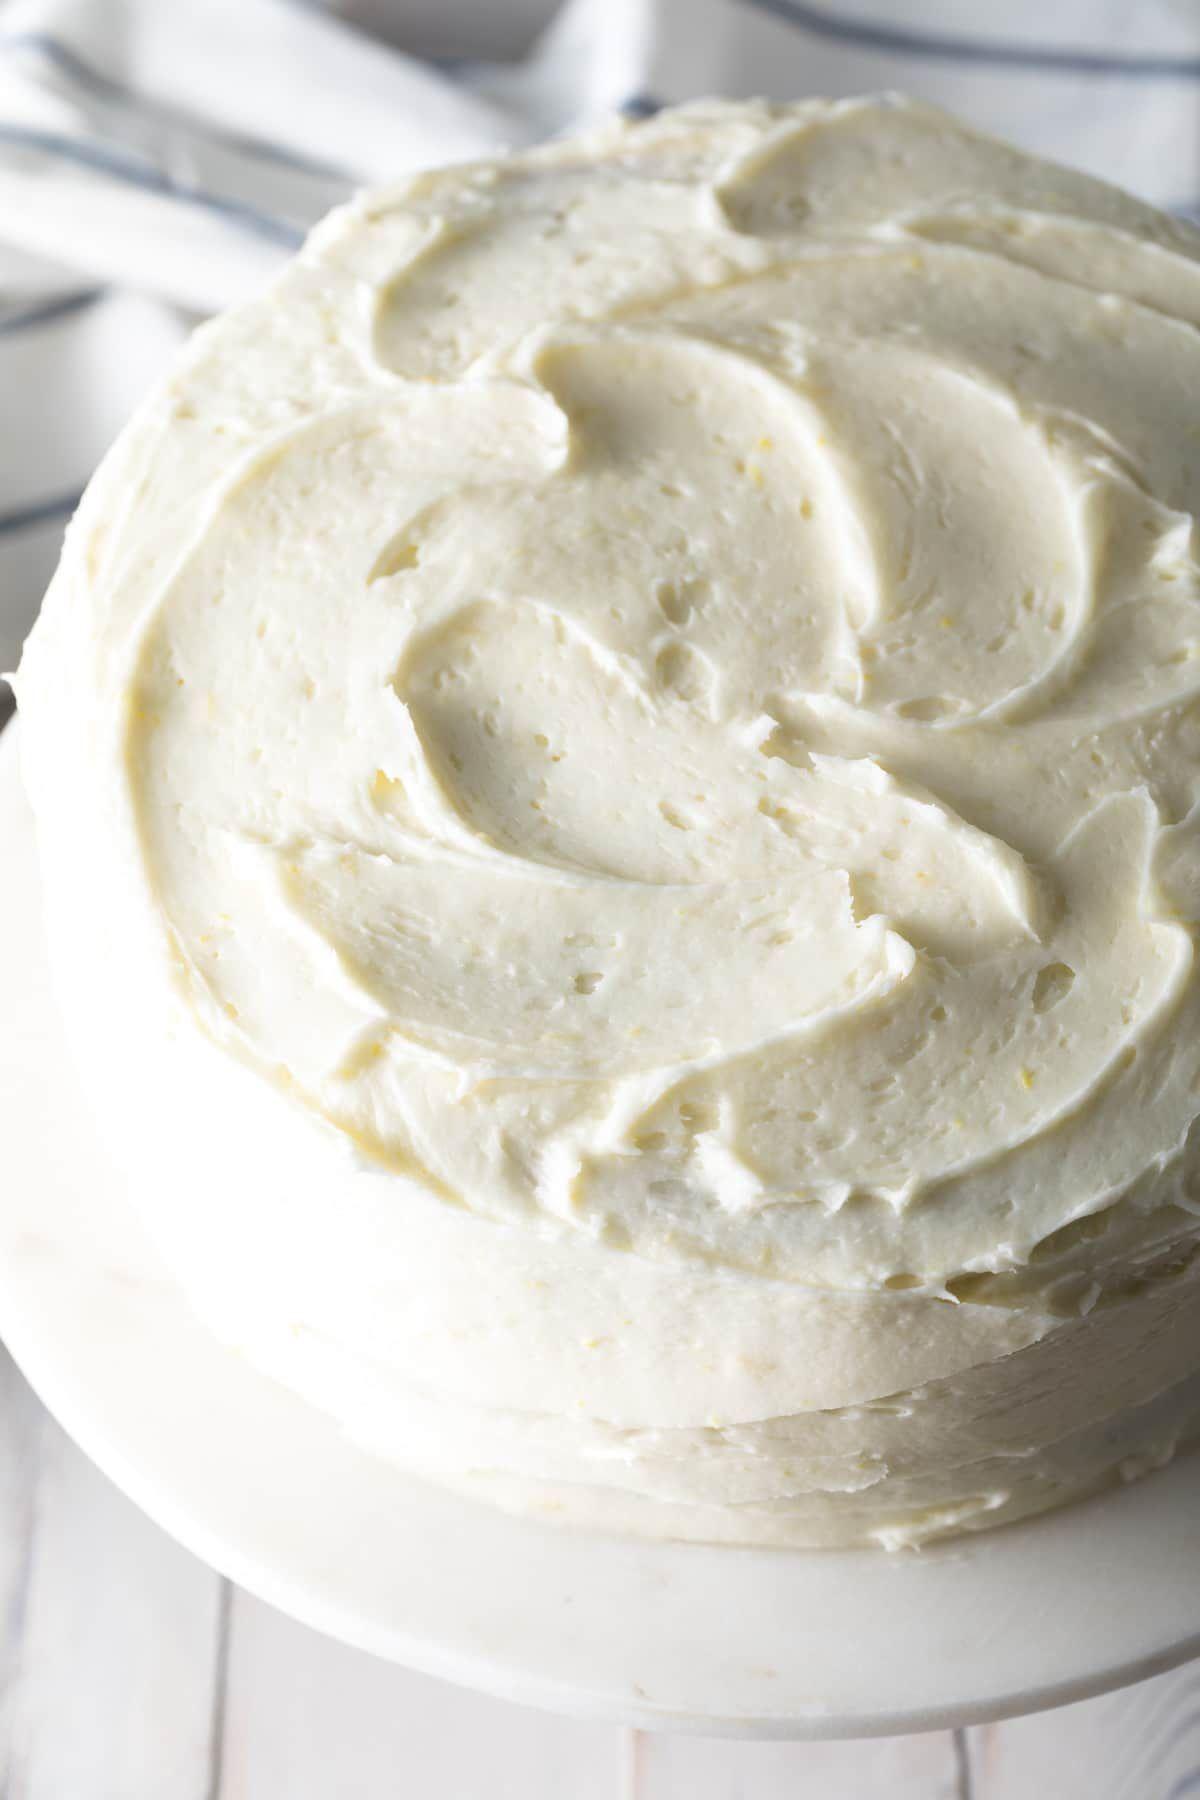 Best Lemon Layer Cake Recipe Aspicyperspective Lemon Cake Easter Lemon Buttermilk Cake Recipe Buttermilk Cake Recipe Cake Recipes